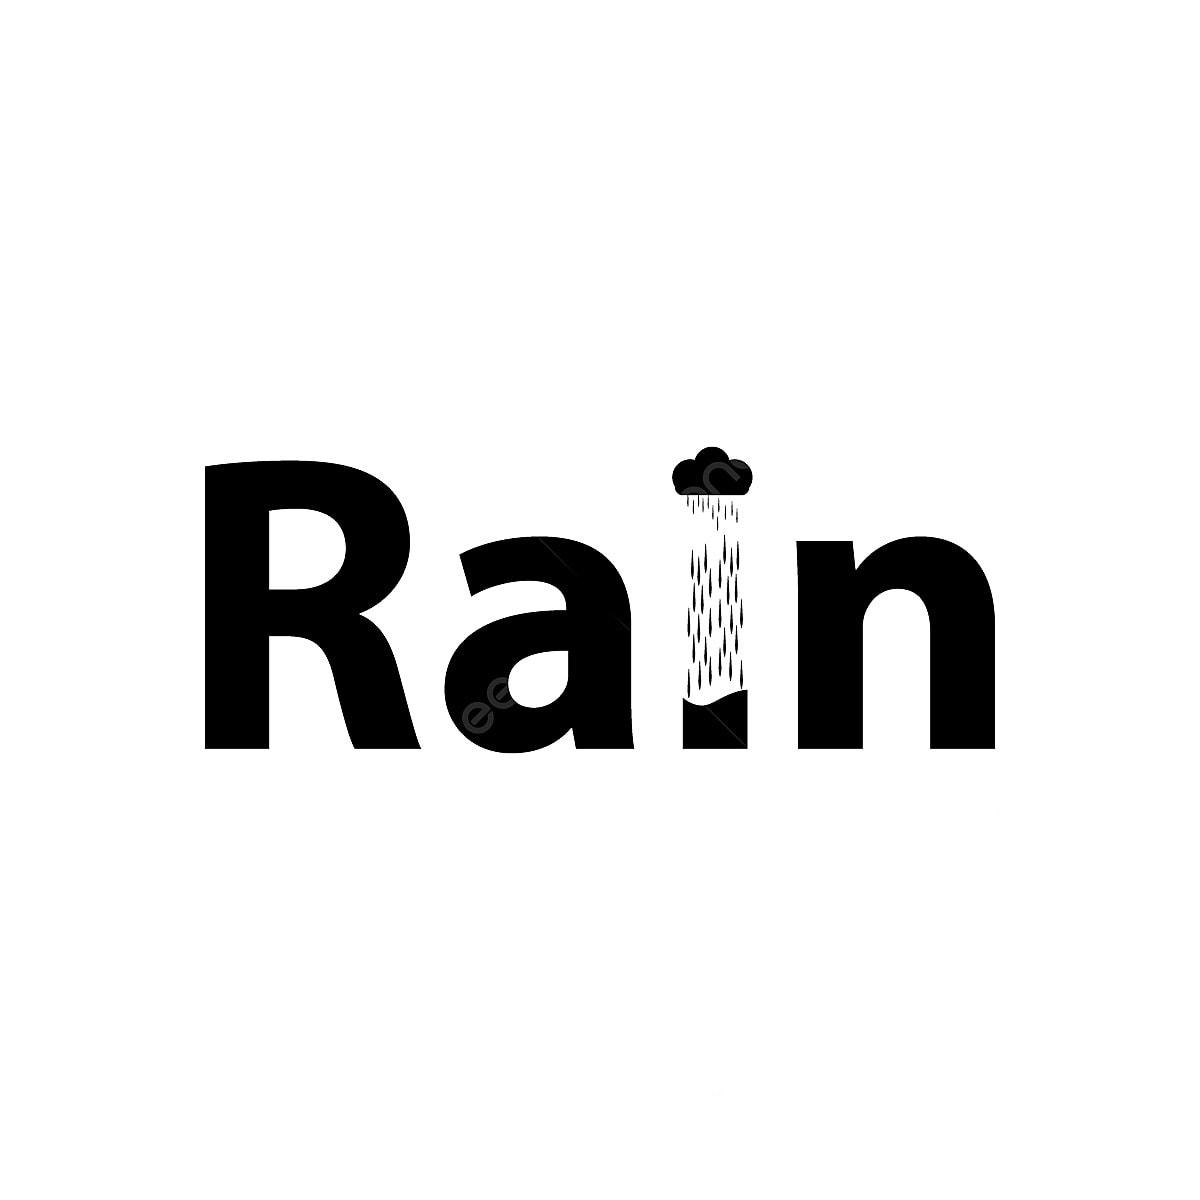 Rain Word Art Design, Rain, Rain Word Art PNG and Vector